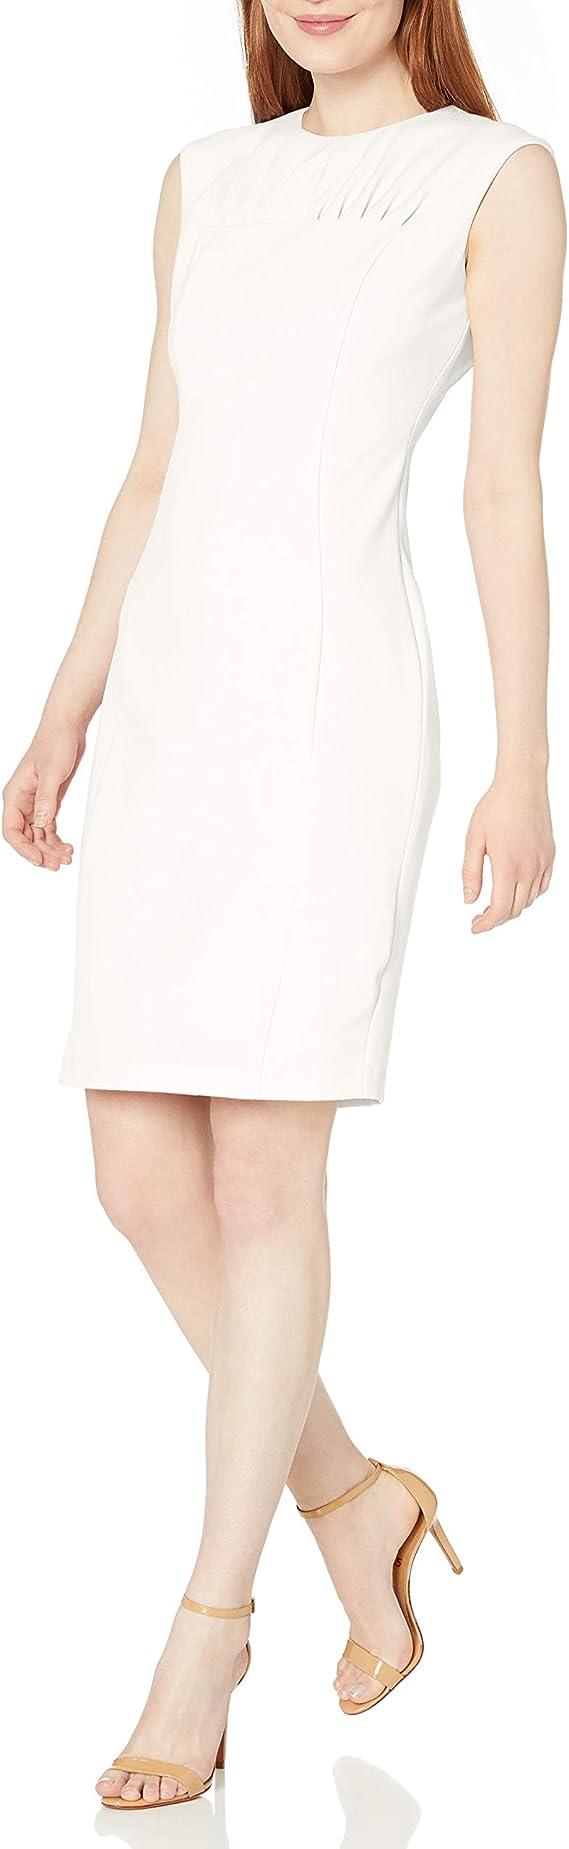 Calvin Klein 卡尔文克莱因 CK 女式无袖连衣裙 4码2.1折$27.45 海淘转运到手约¥212